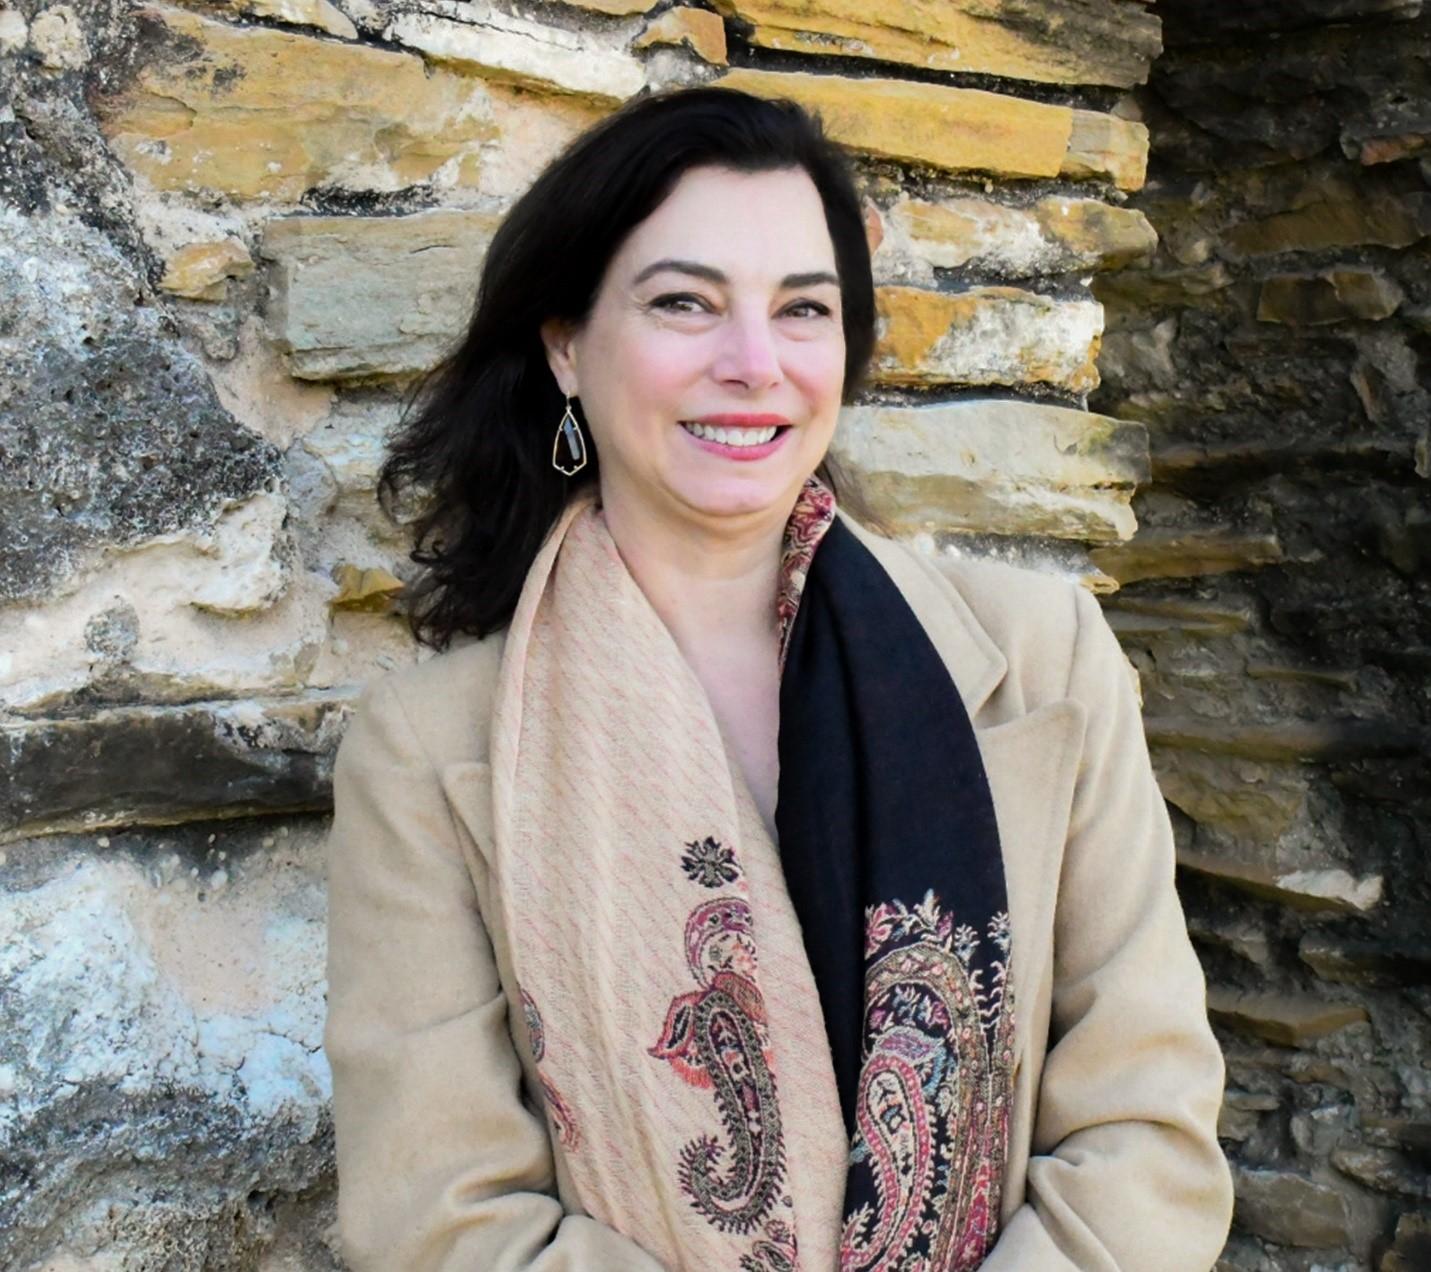 River Authority's Director of Legal Services Allison Elder